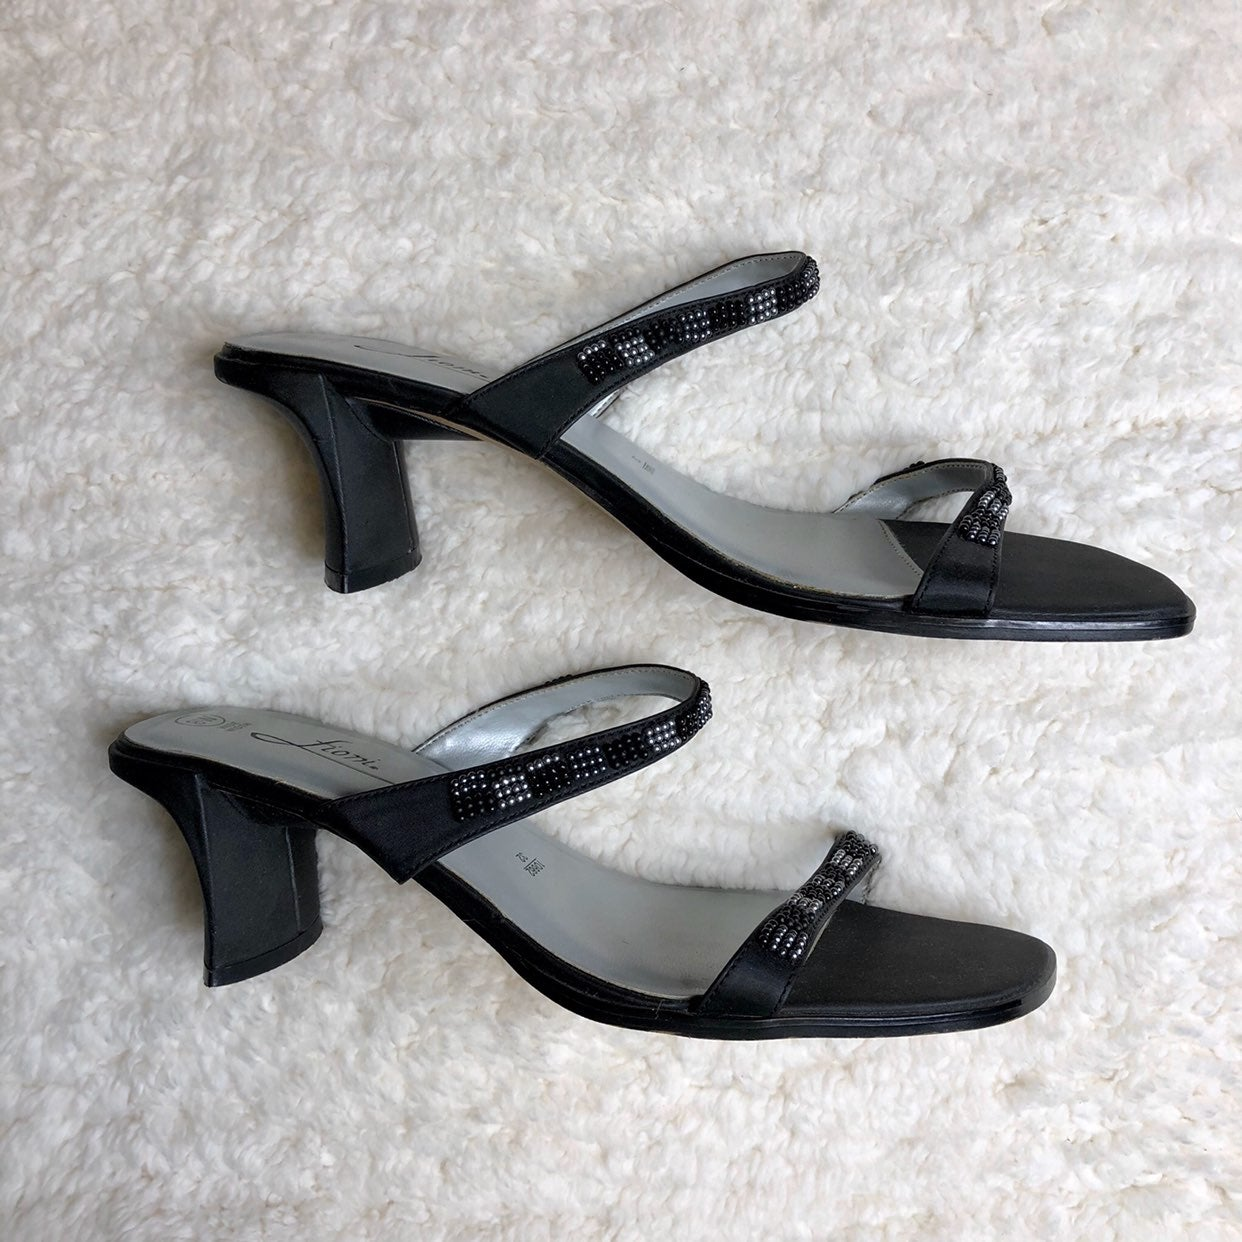 Black Beaded Heeled Sandals